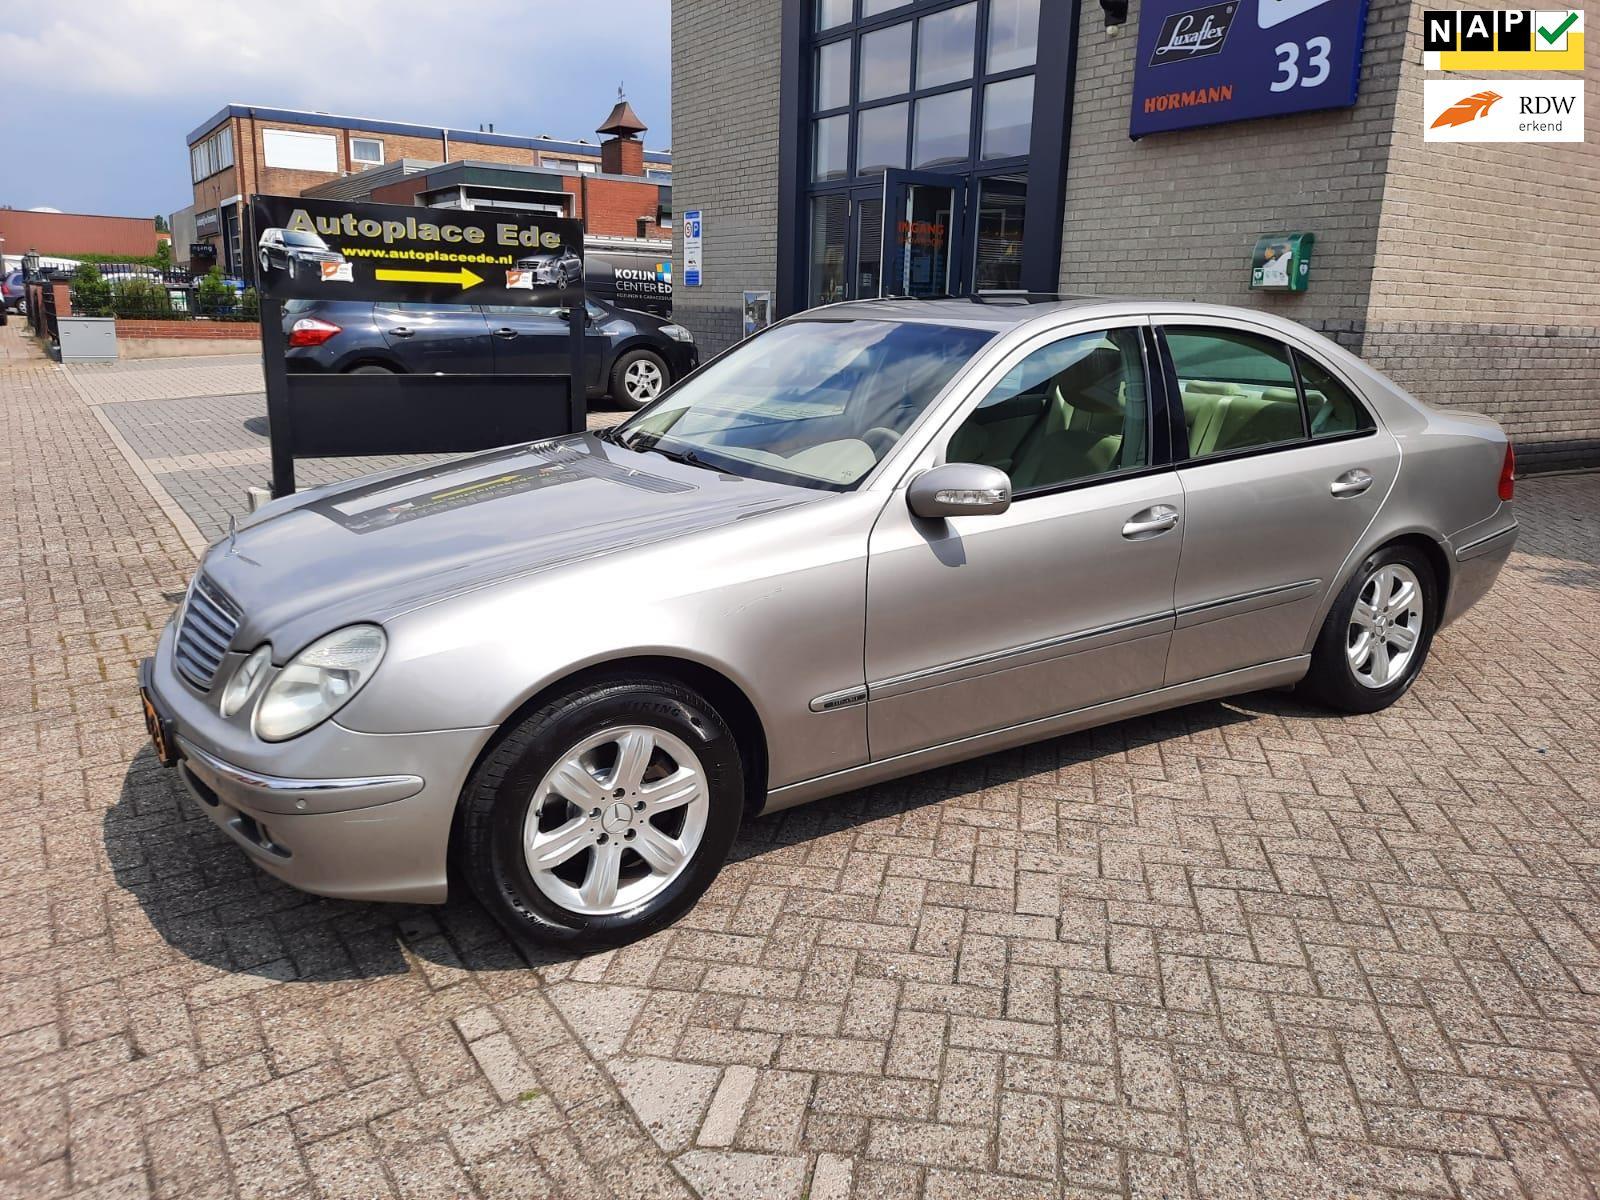 Mercedes-Benz E-klasse occasion - autoplaceede